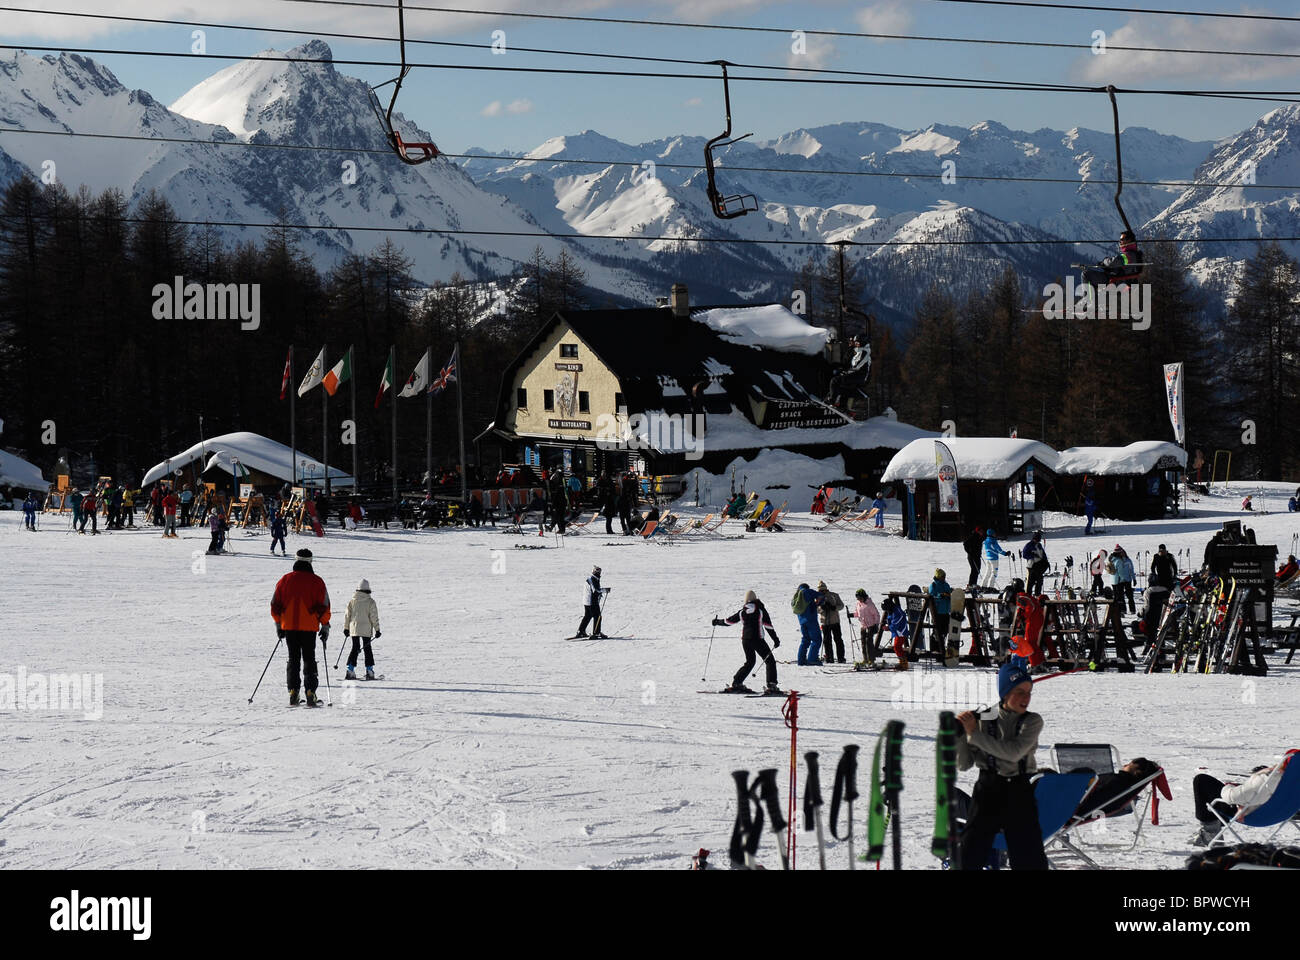 Winter sport. Skiing Sauze D'Oulx, Italy. Sportina - Stock Image